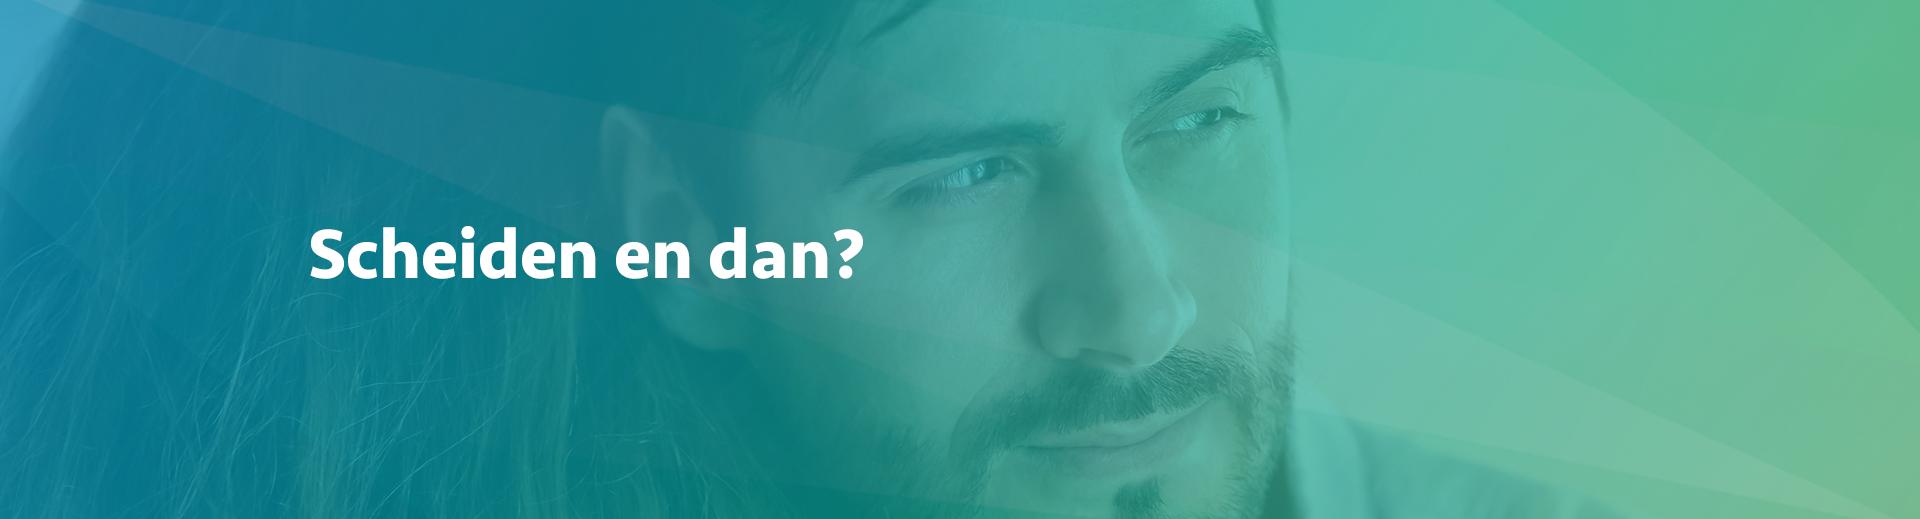 Scheiden en dan? - Scheidingsplanner Midden-Nederland